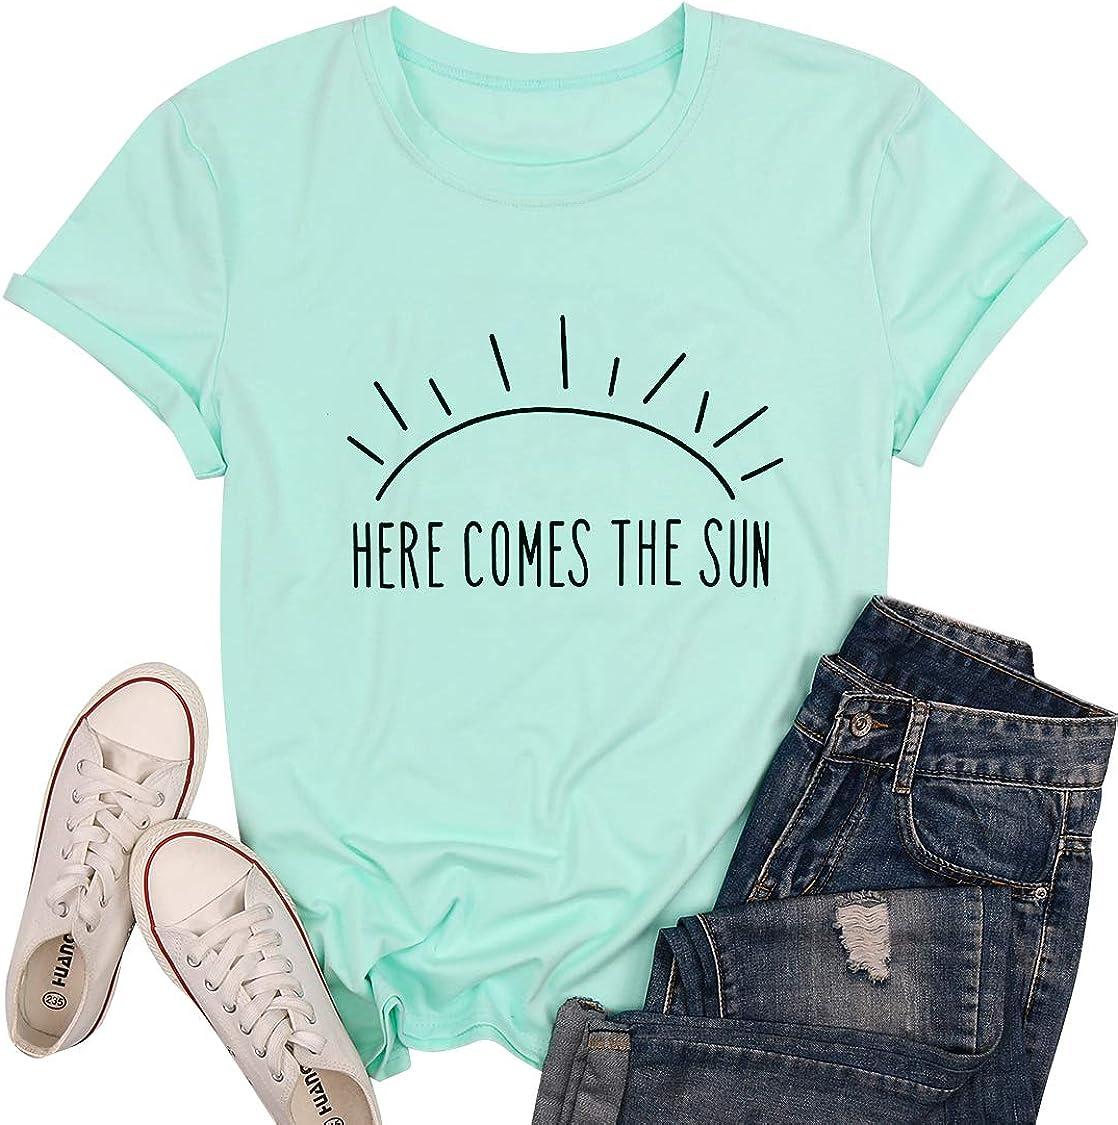 Sunshine Shirt Top Women Summer Short Sleeve Graphic Print T Shirt Nature Shirt Vacation Shirt White Blouse